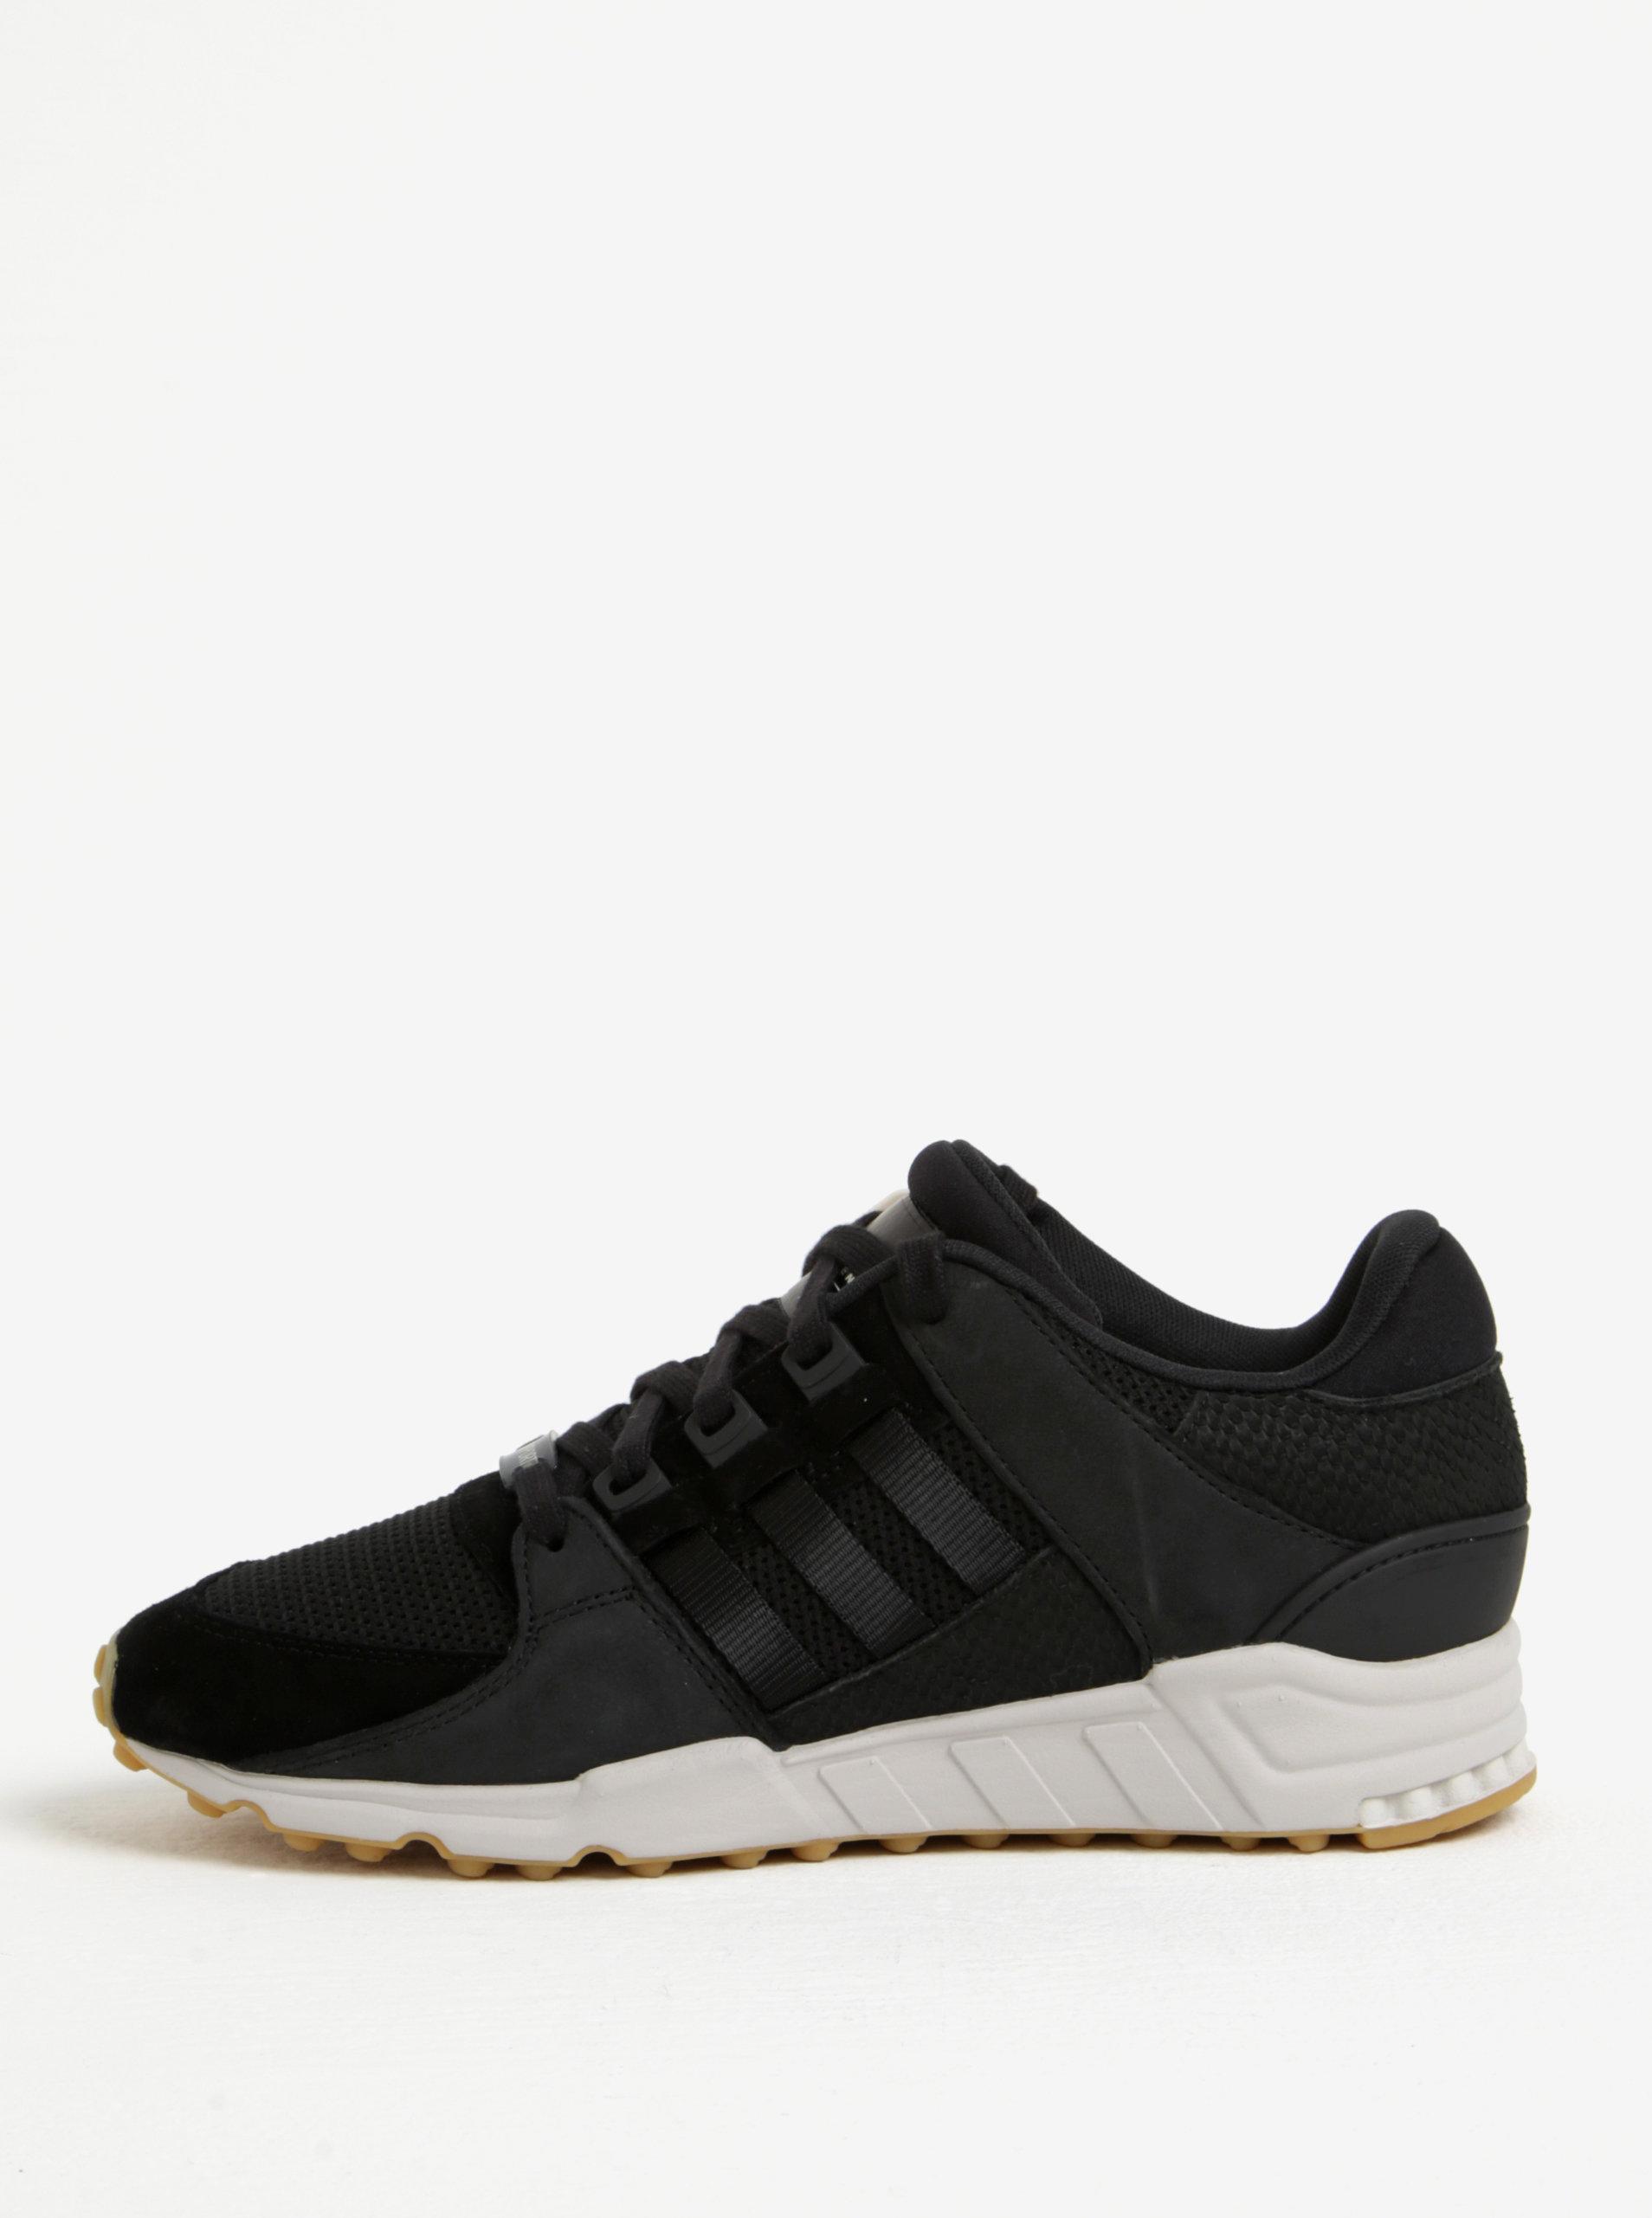 7a06abf3c Čierne pánske tenisky so semišovými detailmi adidas Originals Support ...